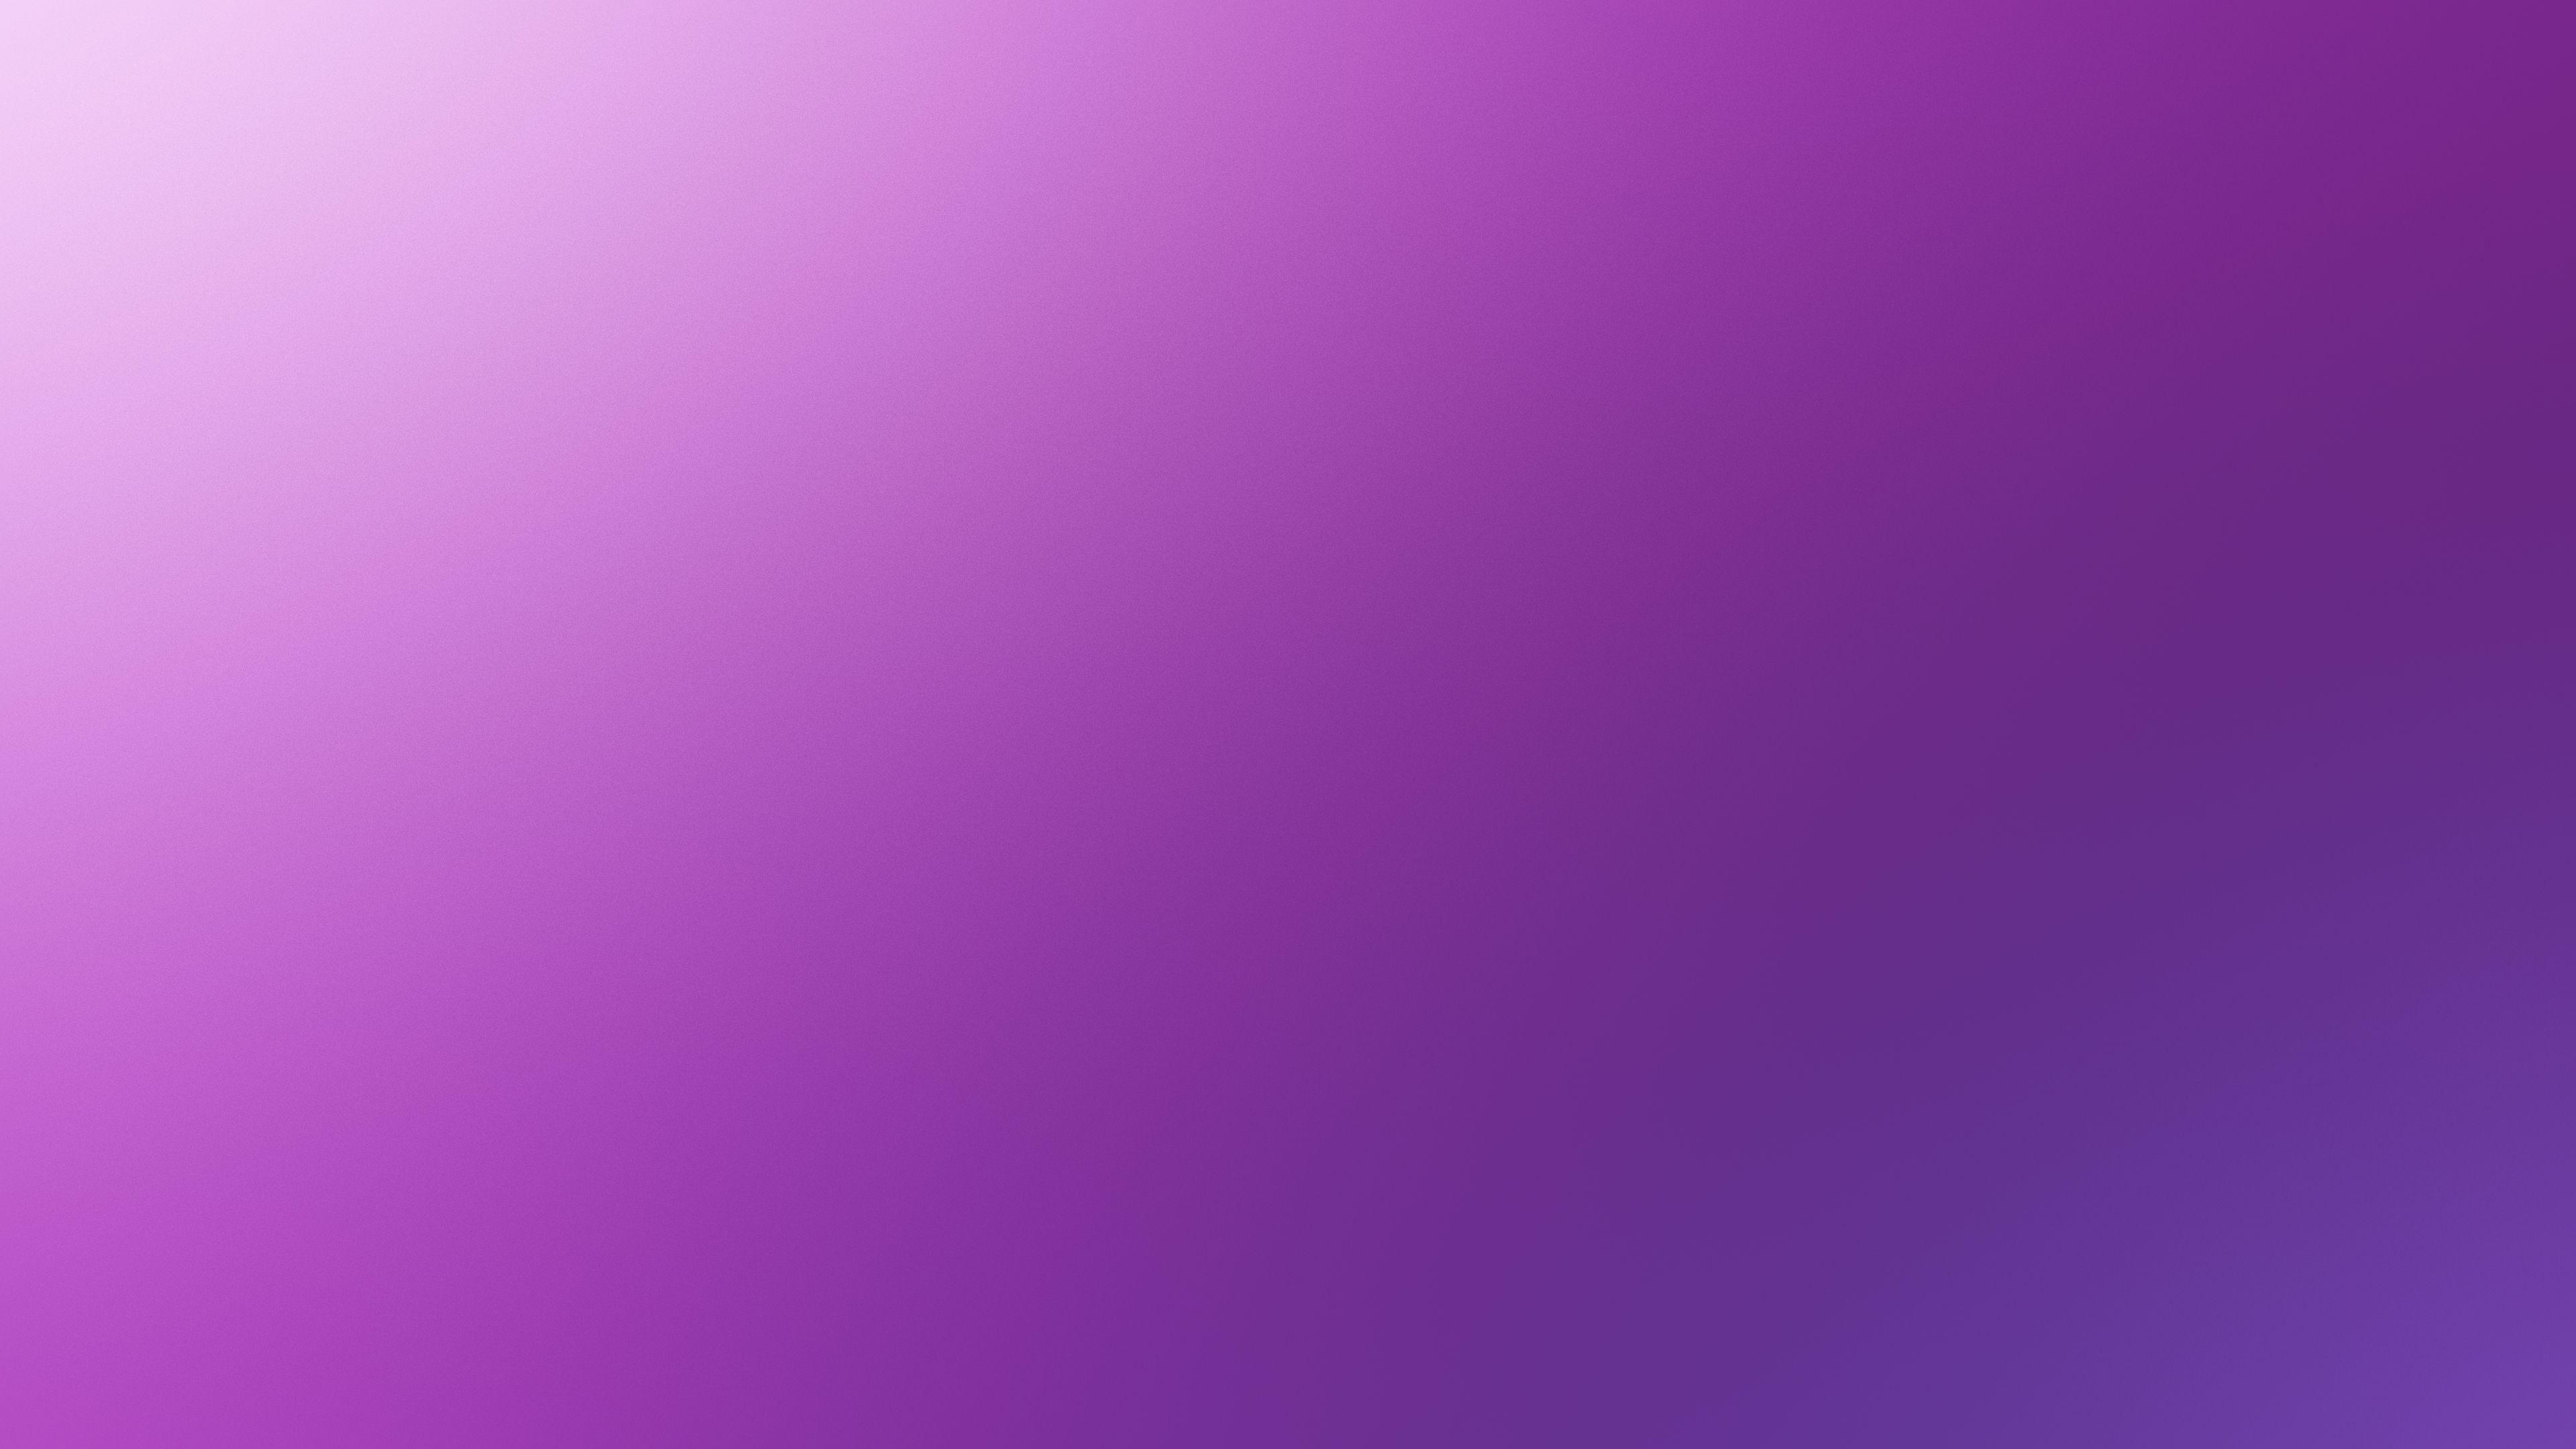 Purple Gradient Wallpapers Top Free Purple Gradient Backgrounds Wallpaperaccess